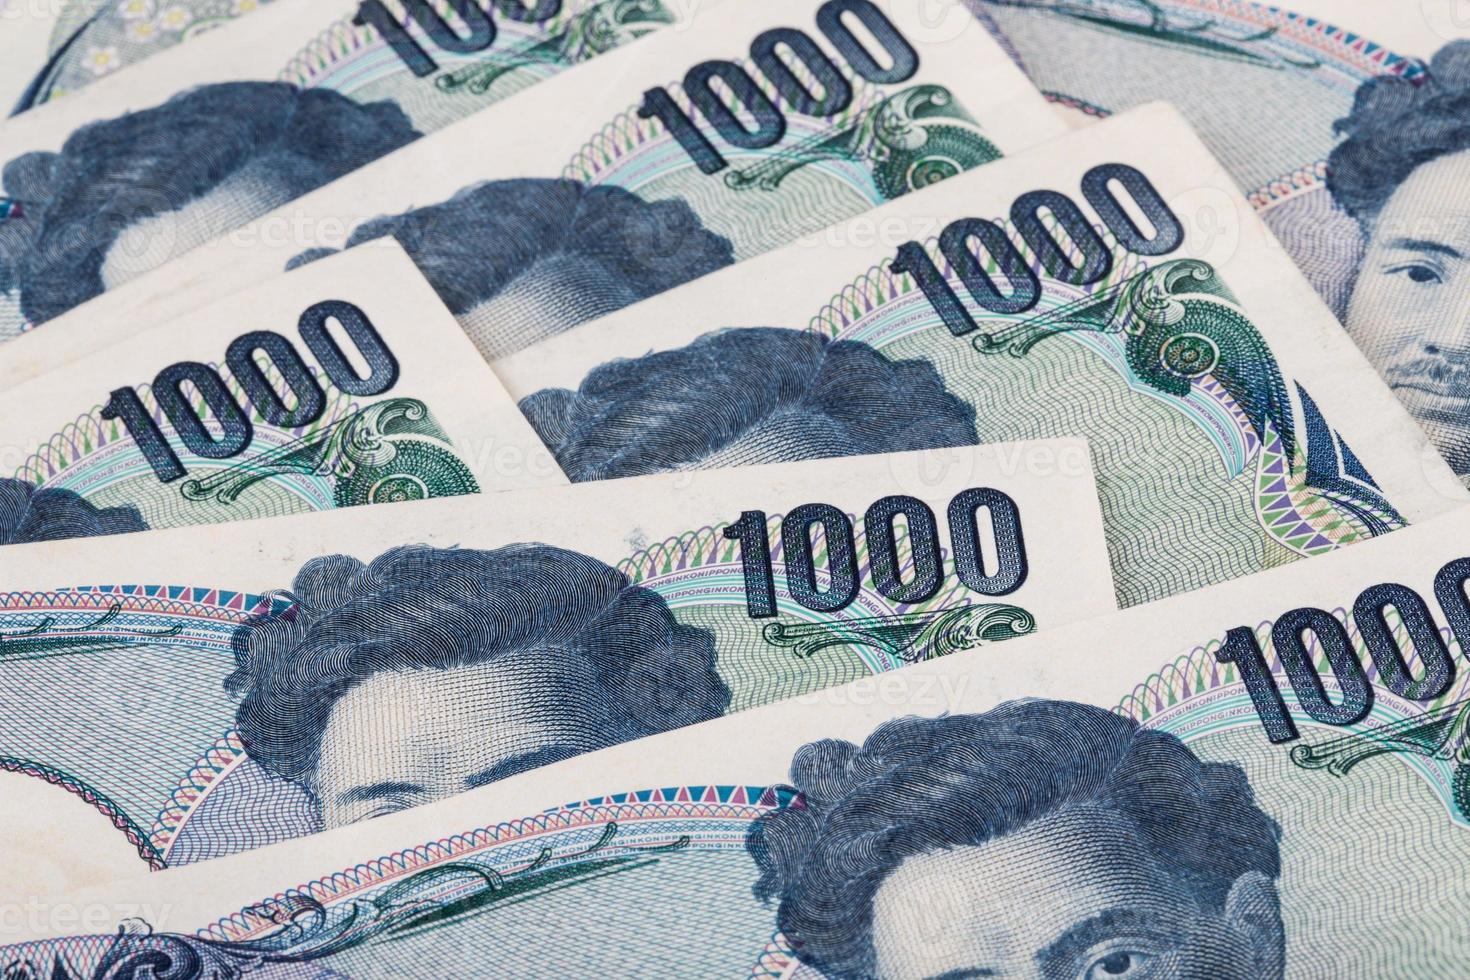 Stapel japanischer Währung Yen oder japanische Banknoten foto